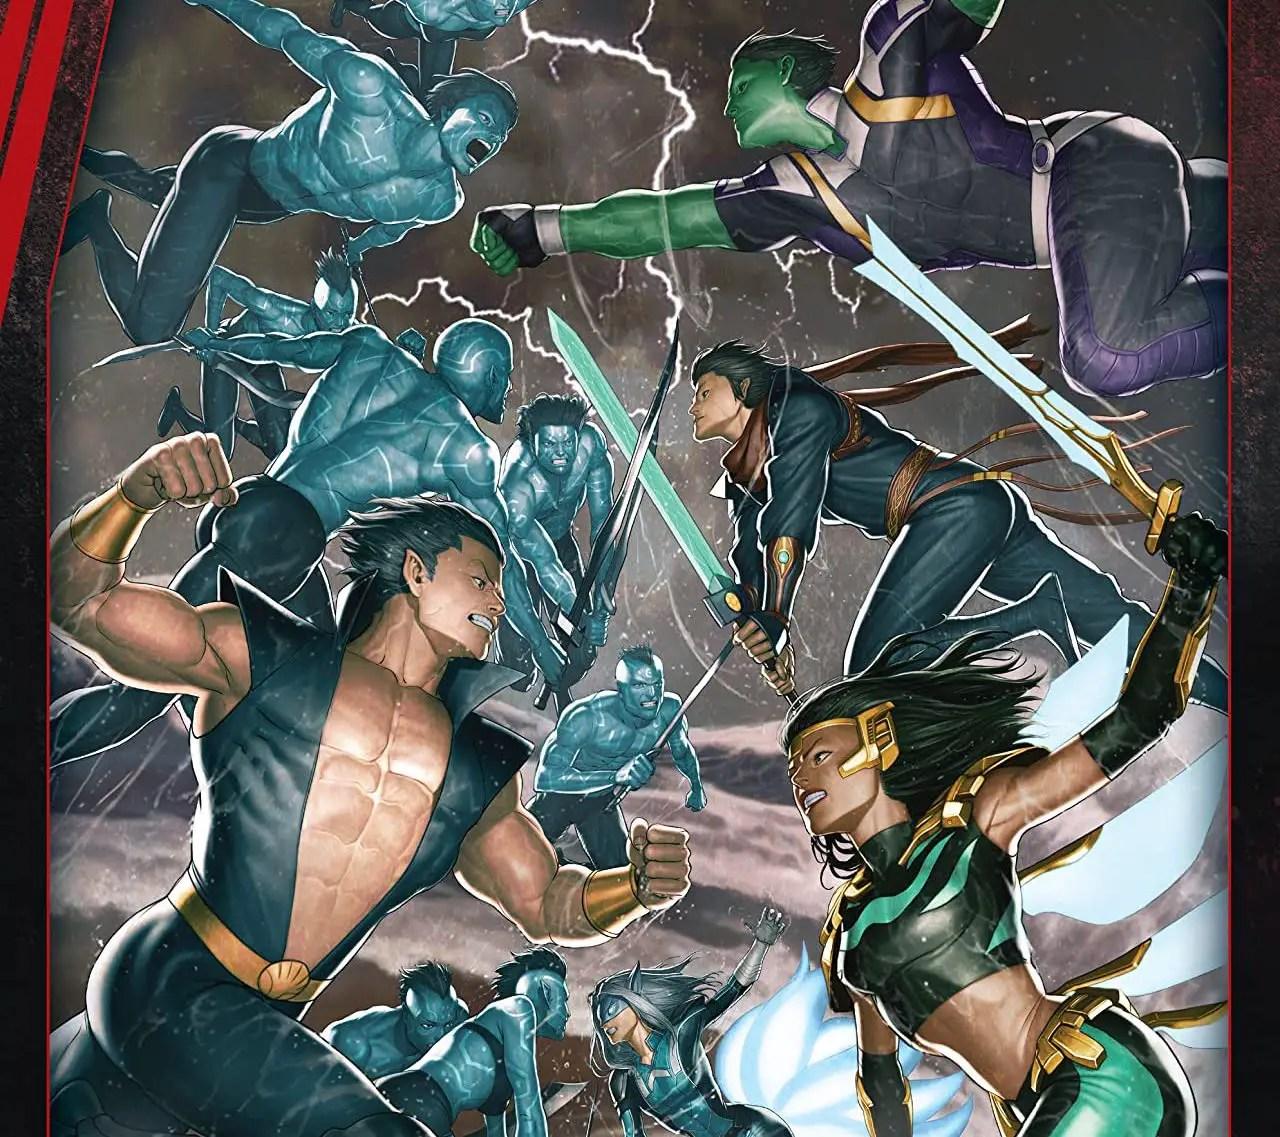 'Atlantis Attacks' is good team comics